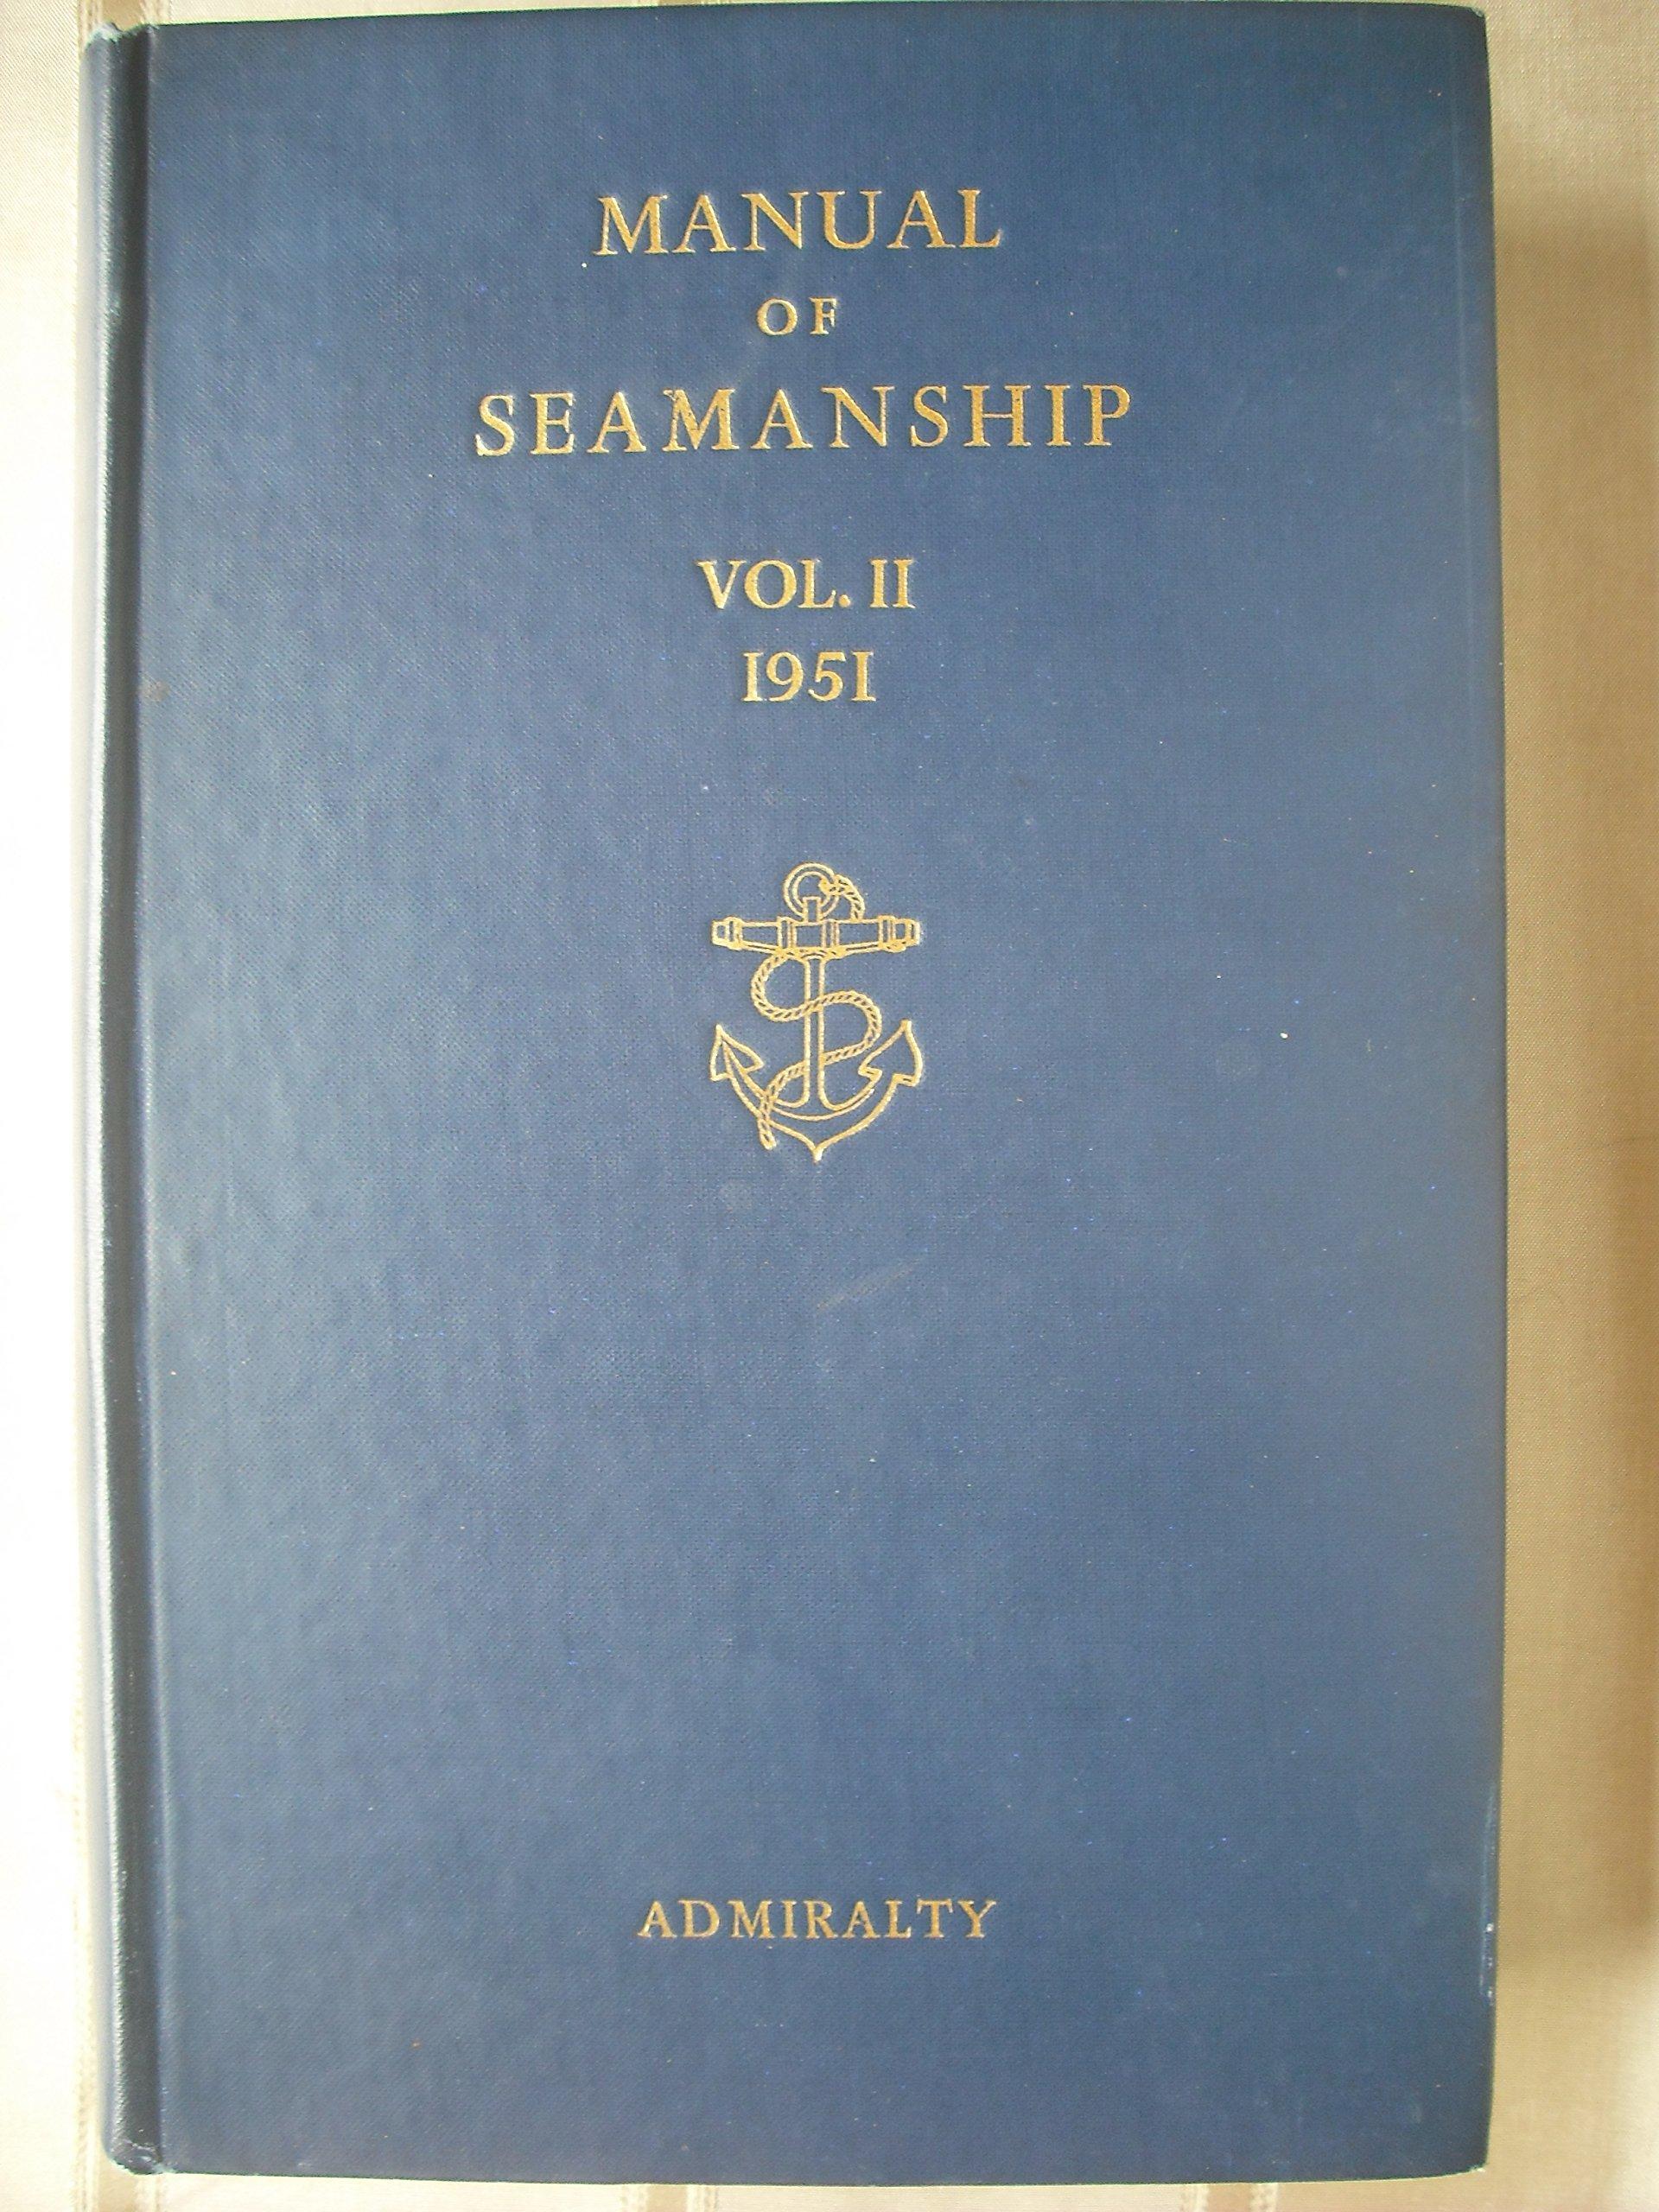 Manual of Seamanship Vol. II 1951 Admiralty B. R. 67 (2/51): Amazon.co.uk:  Admiralty: Books